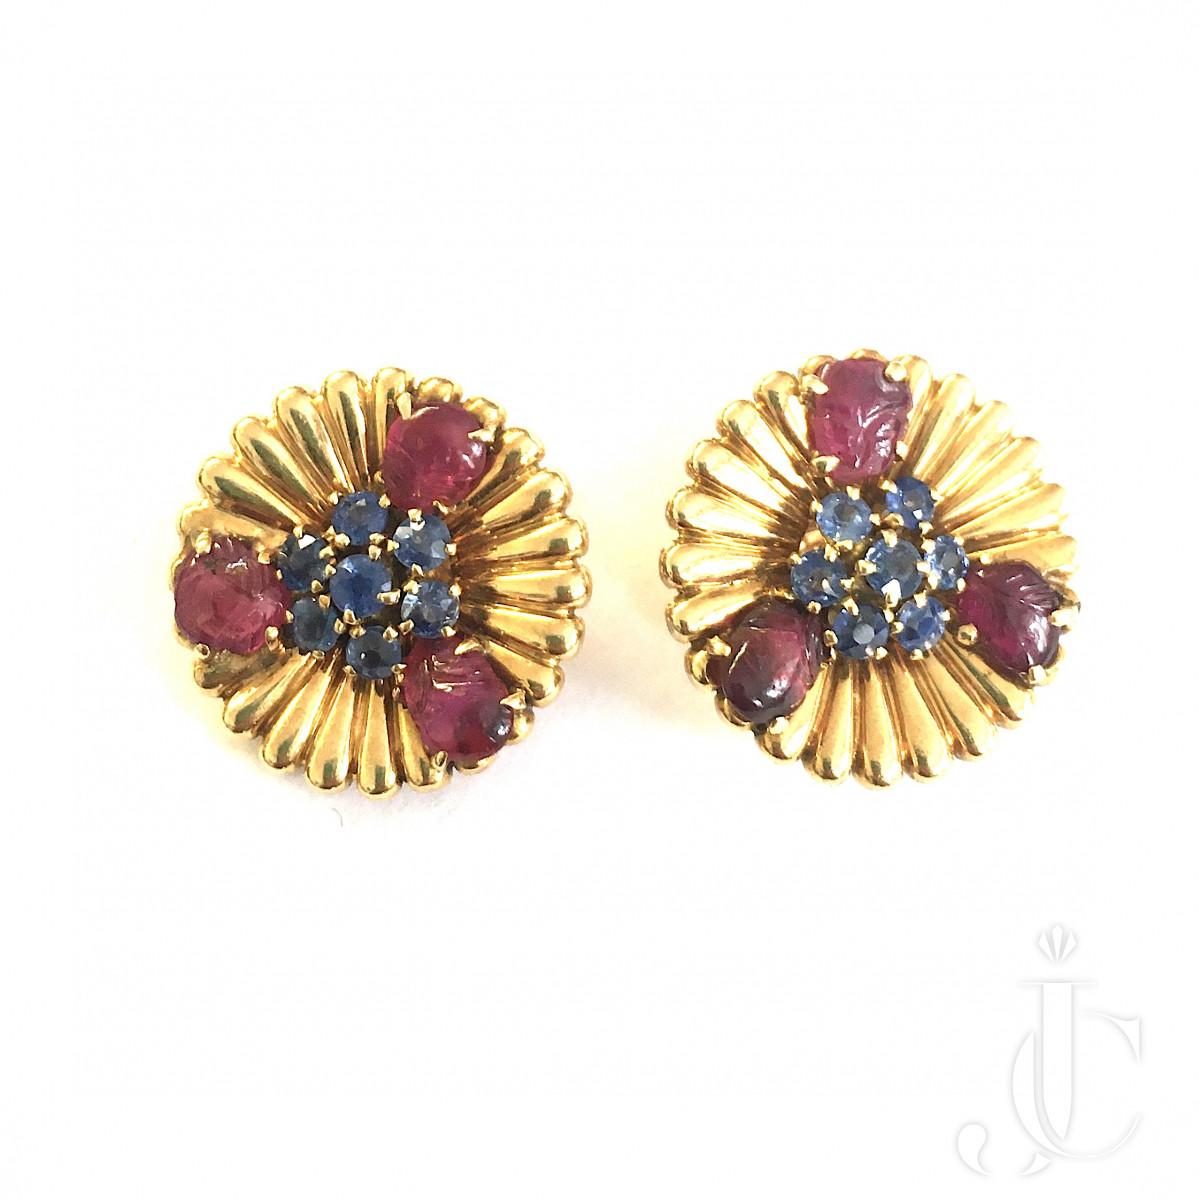 Mellerio Paris Sapphire and Ruby Earrings